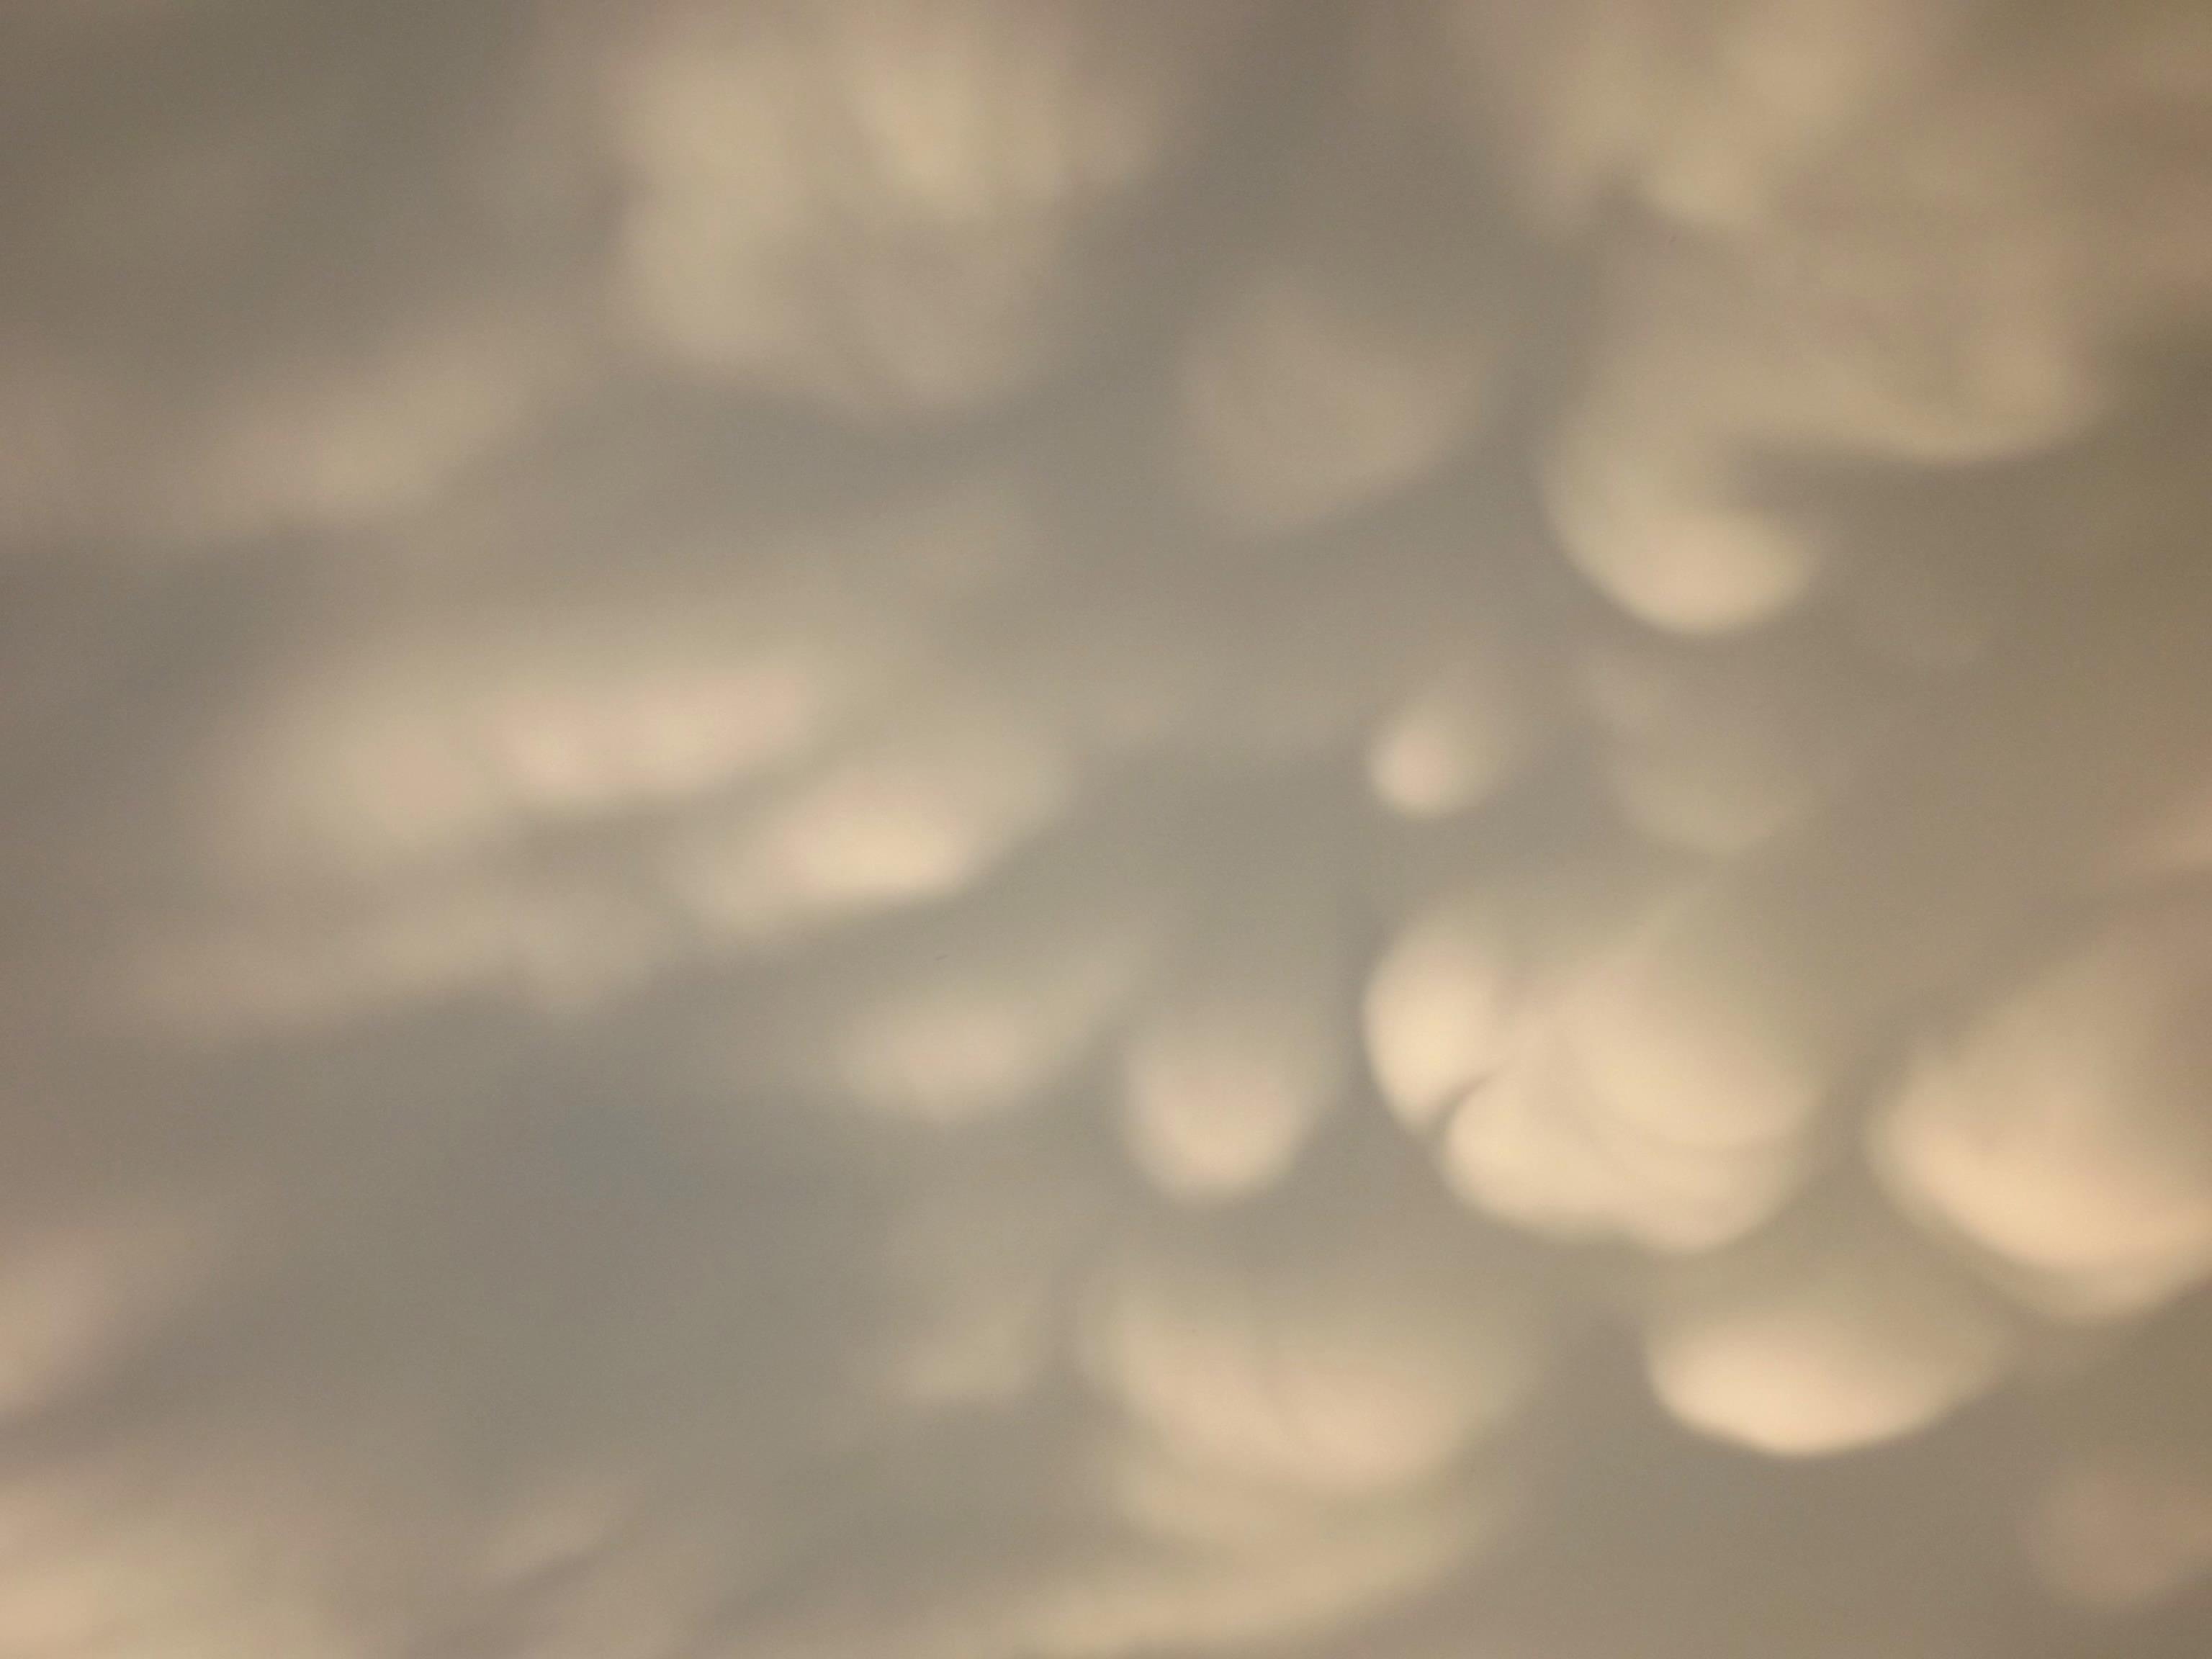 6248-himmel-wolken-zuckerwatte